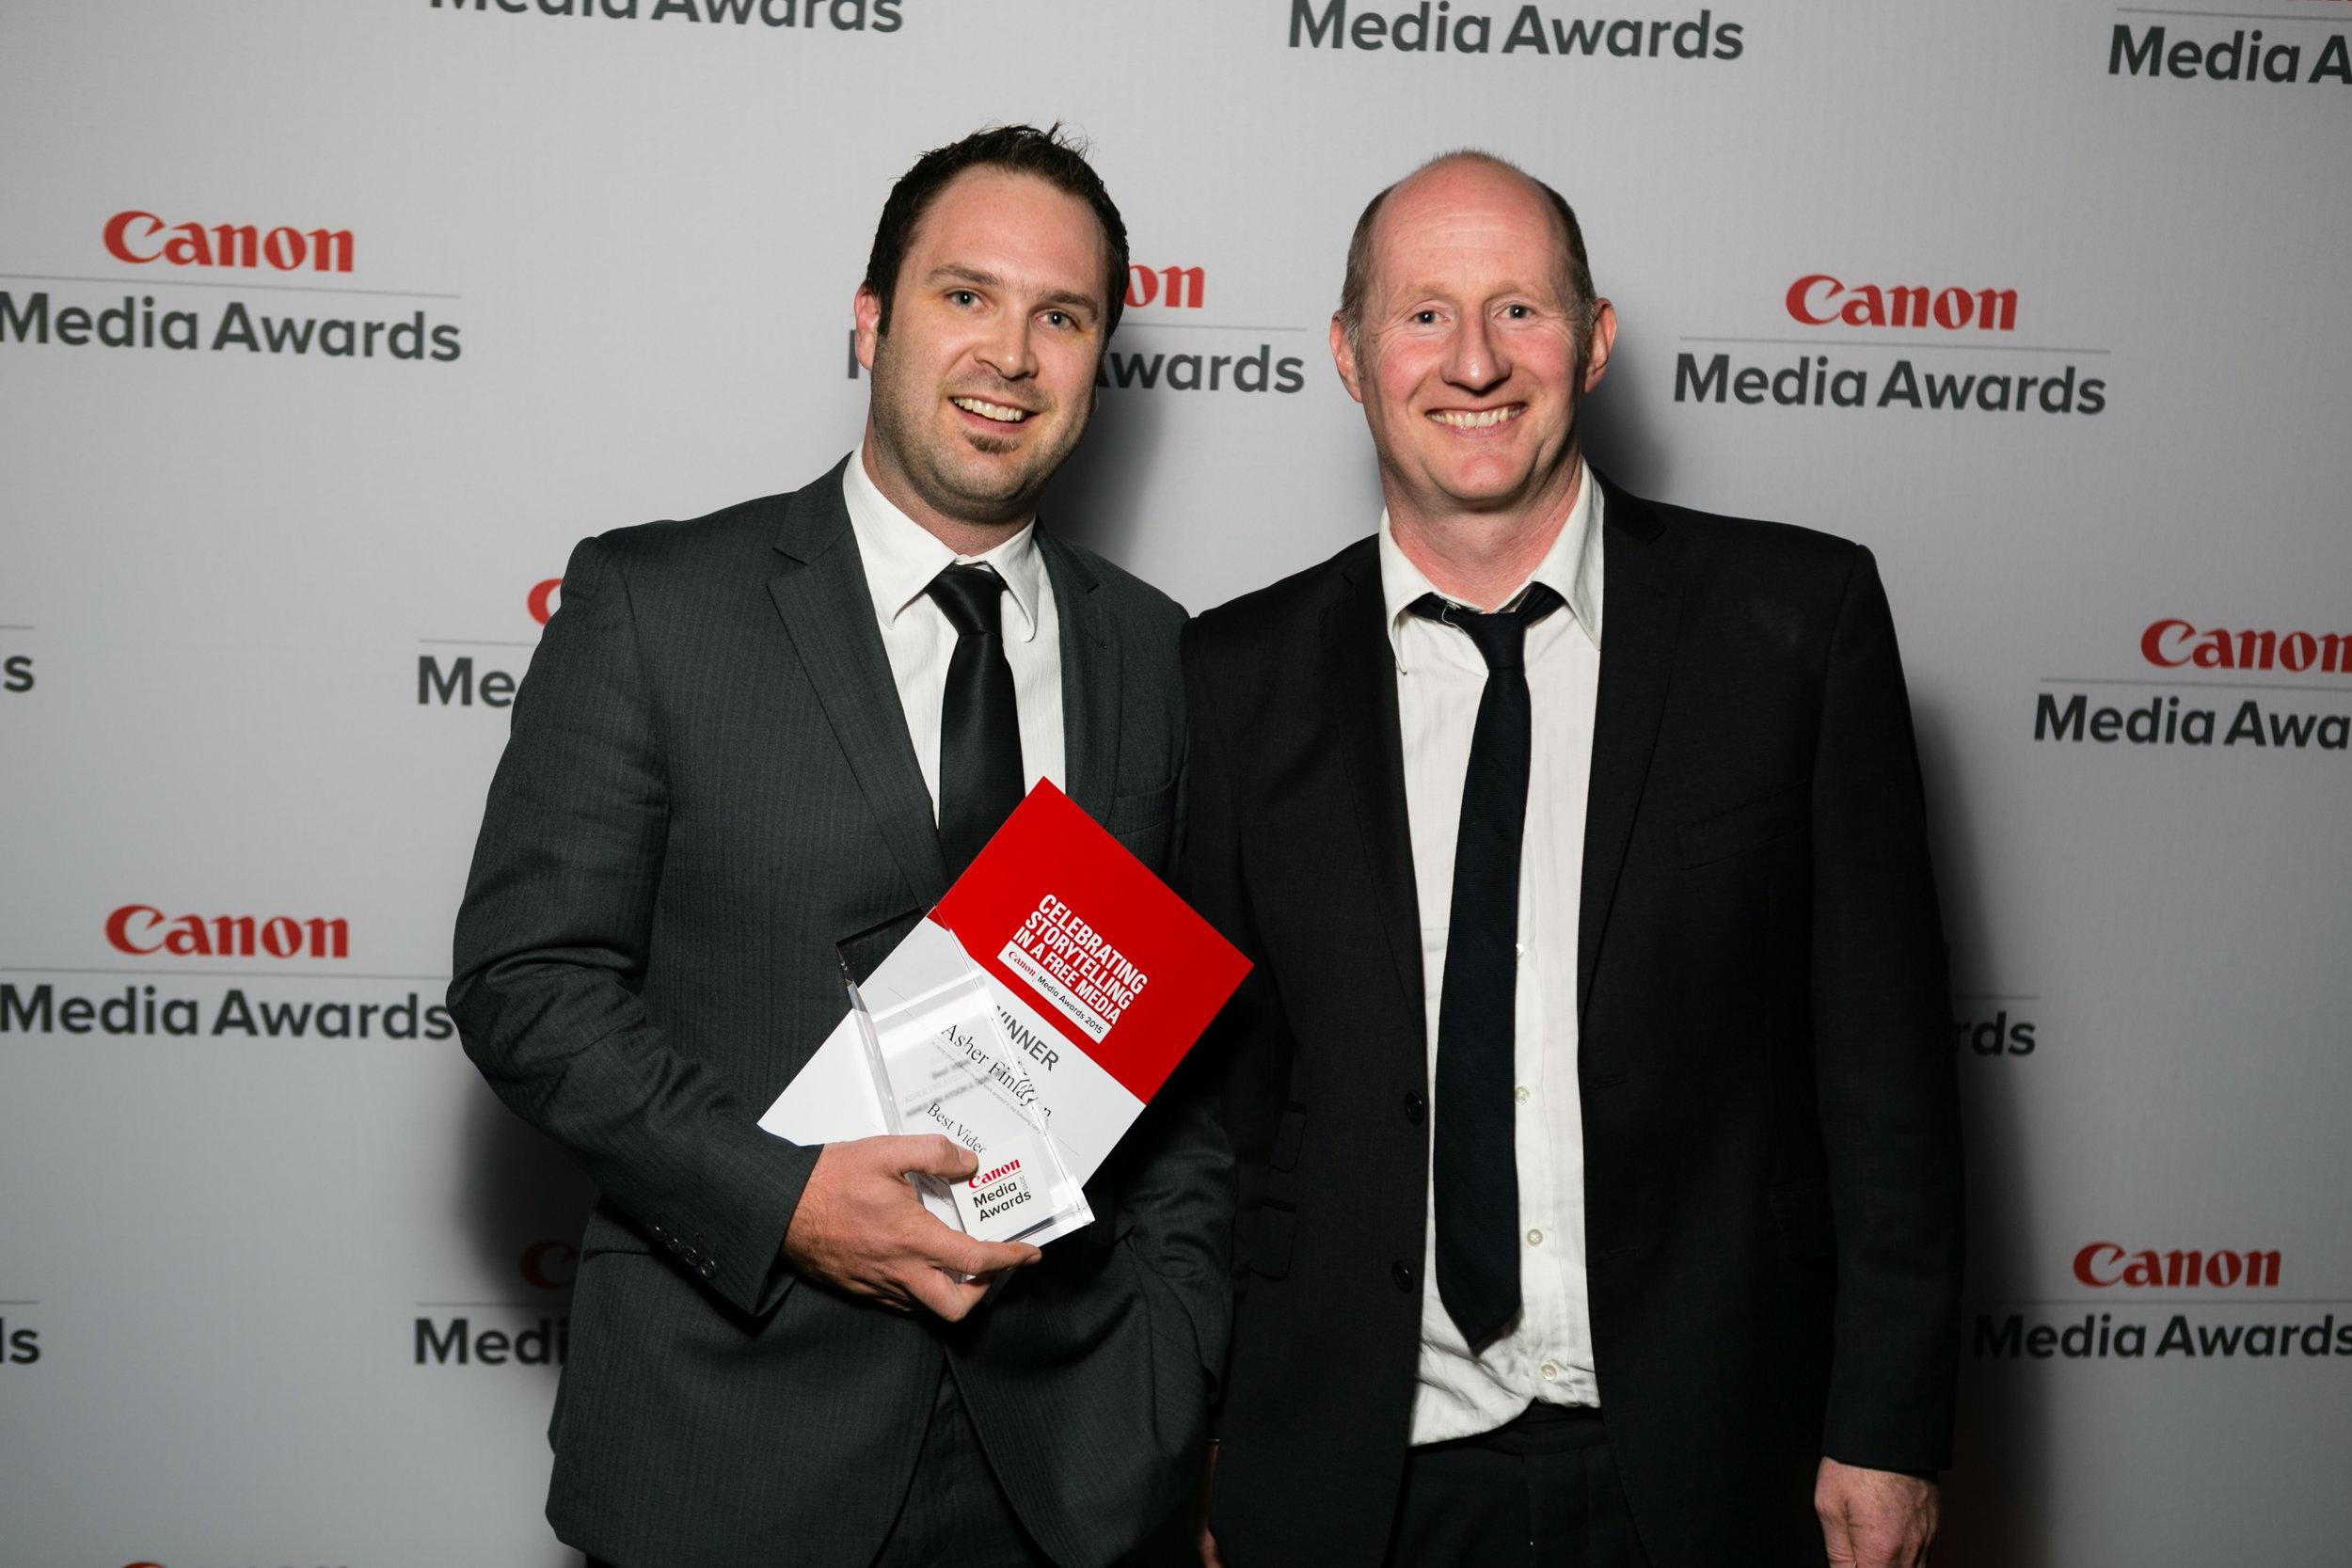 canon_media_awards_2015_interlike_nz_clinton_tudor-6003-217.jpg